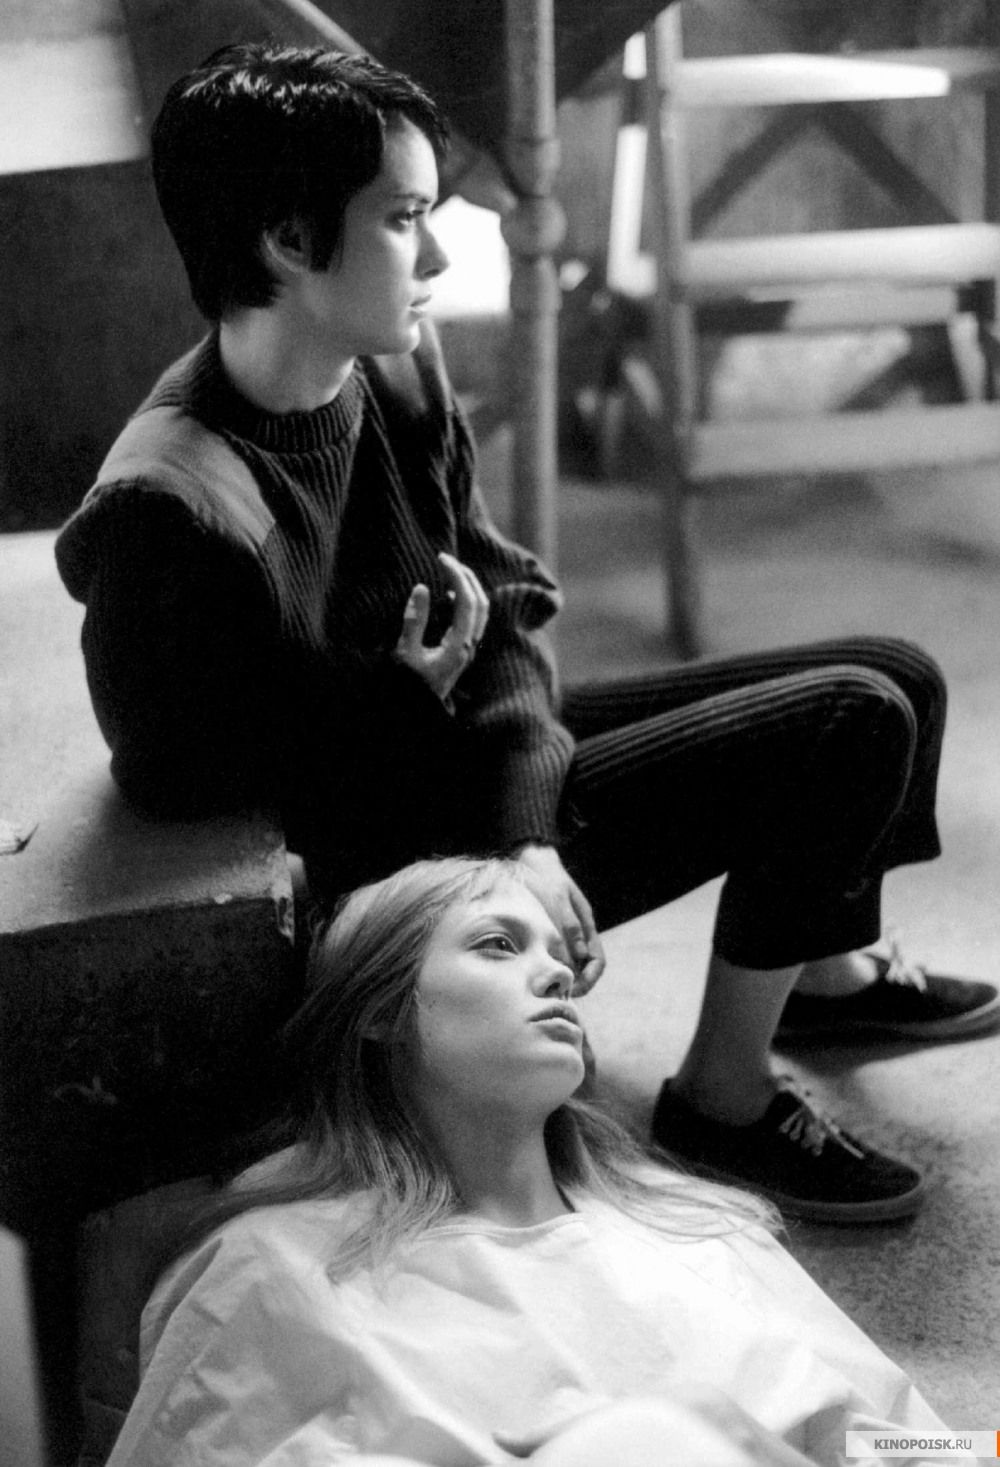 Girl, Interrupted | Прерванная жизнь (Джеймс Мэнголд, 1999)